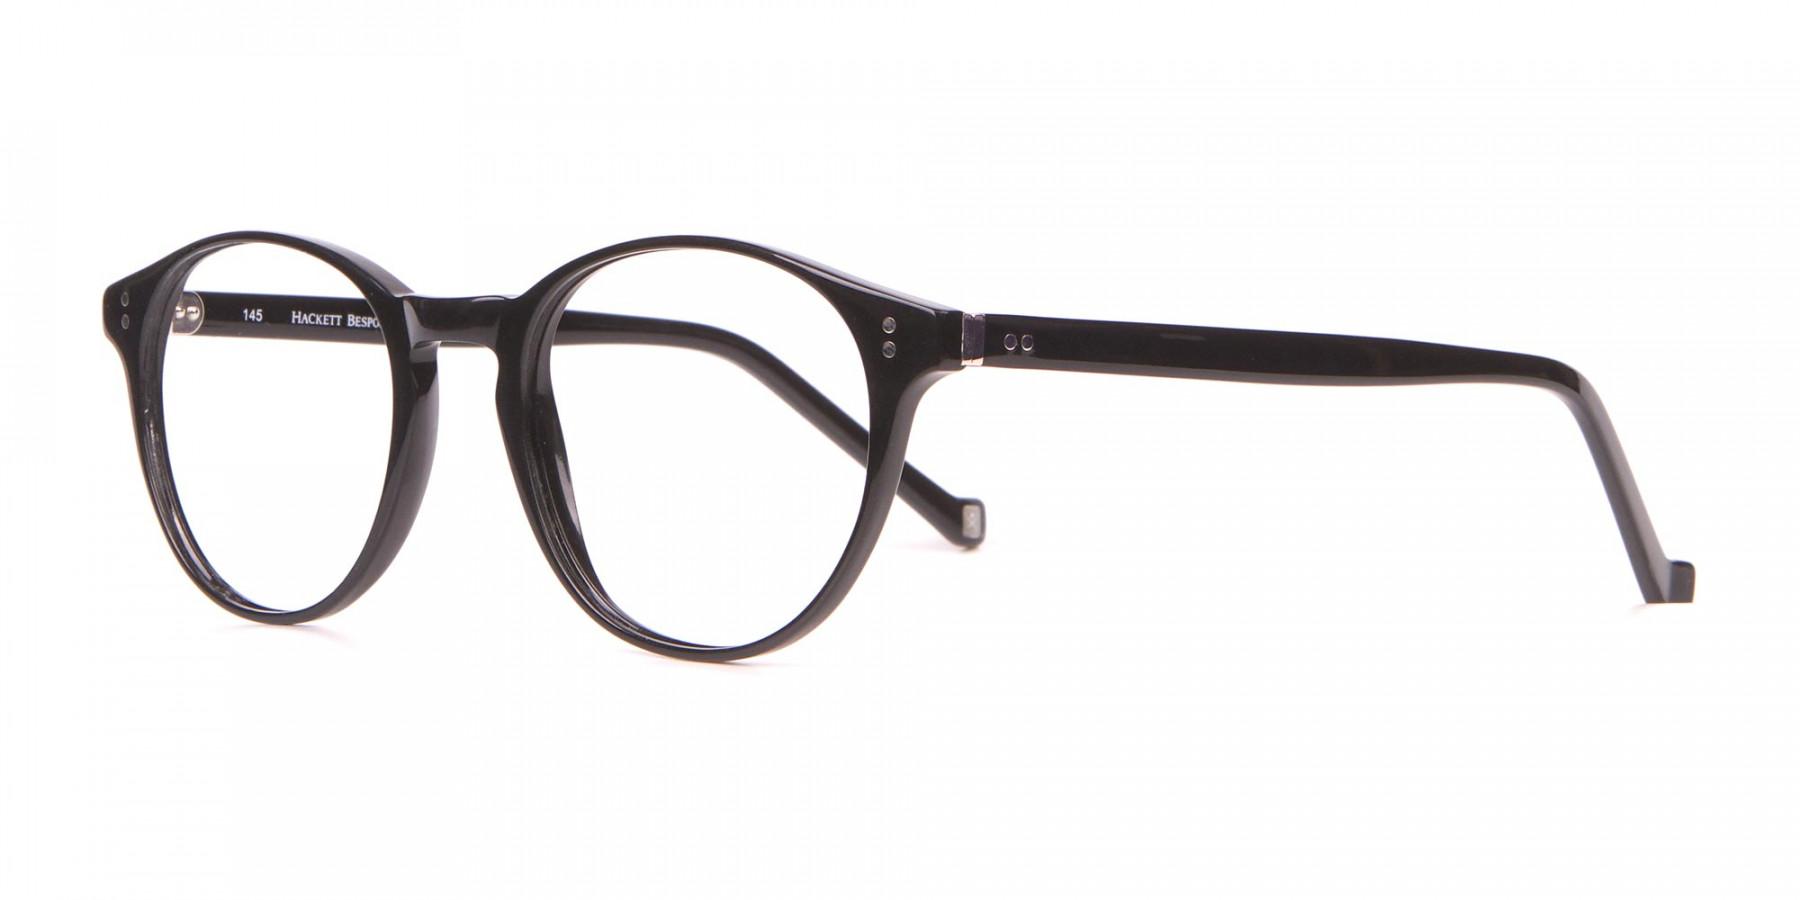 HACKETT Bespoke HEB218 Petite Round Glasses In Black -1